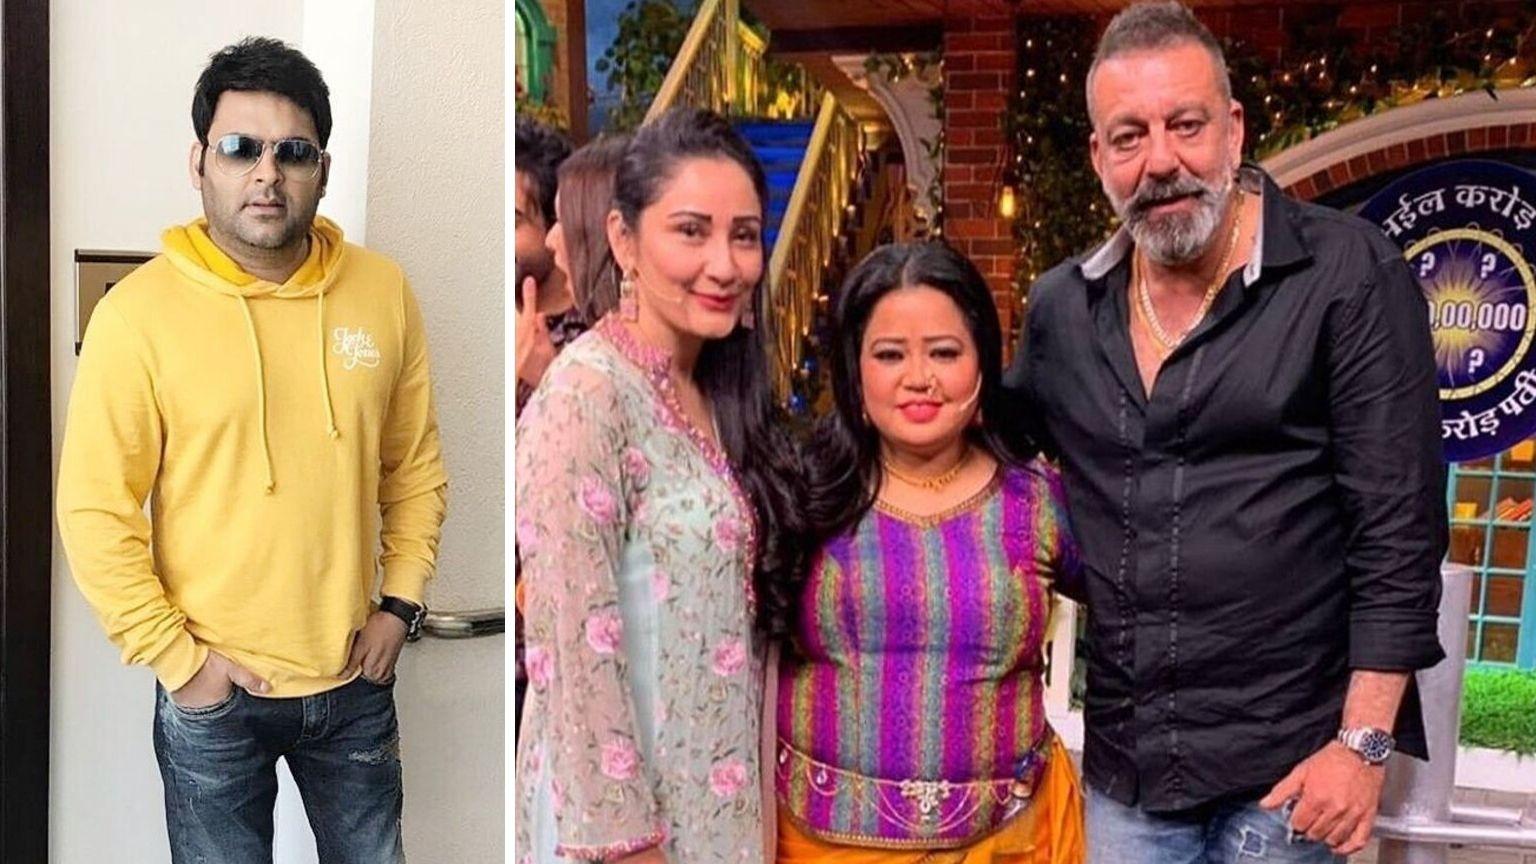 Sanjay Dutt's Cheeky Response to Kapil Sharma Will Make You Laugh